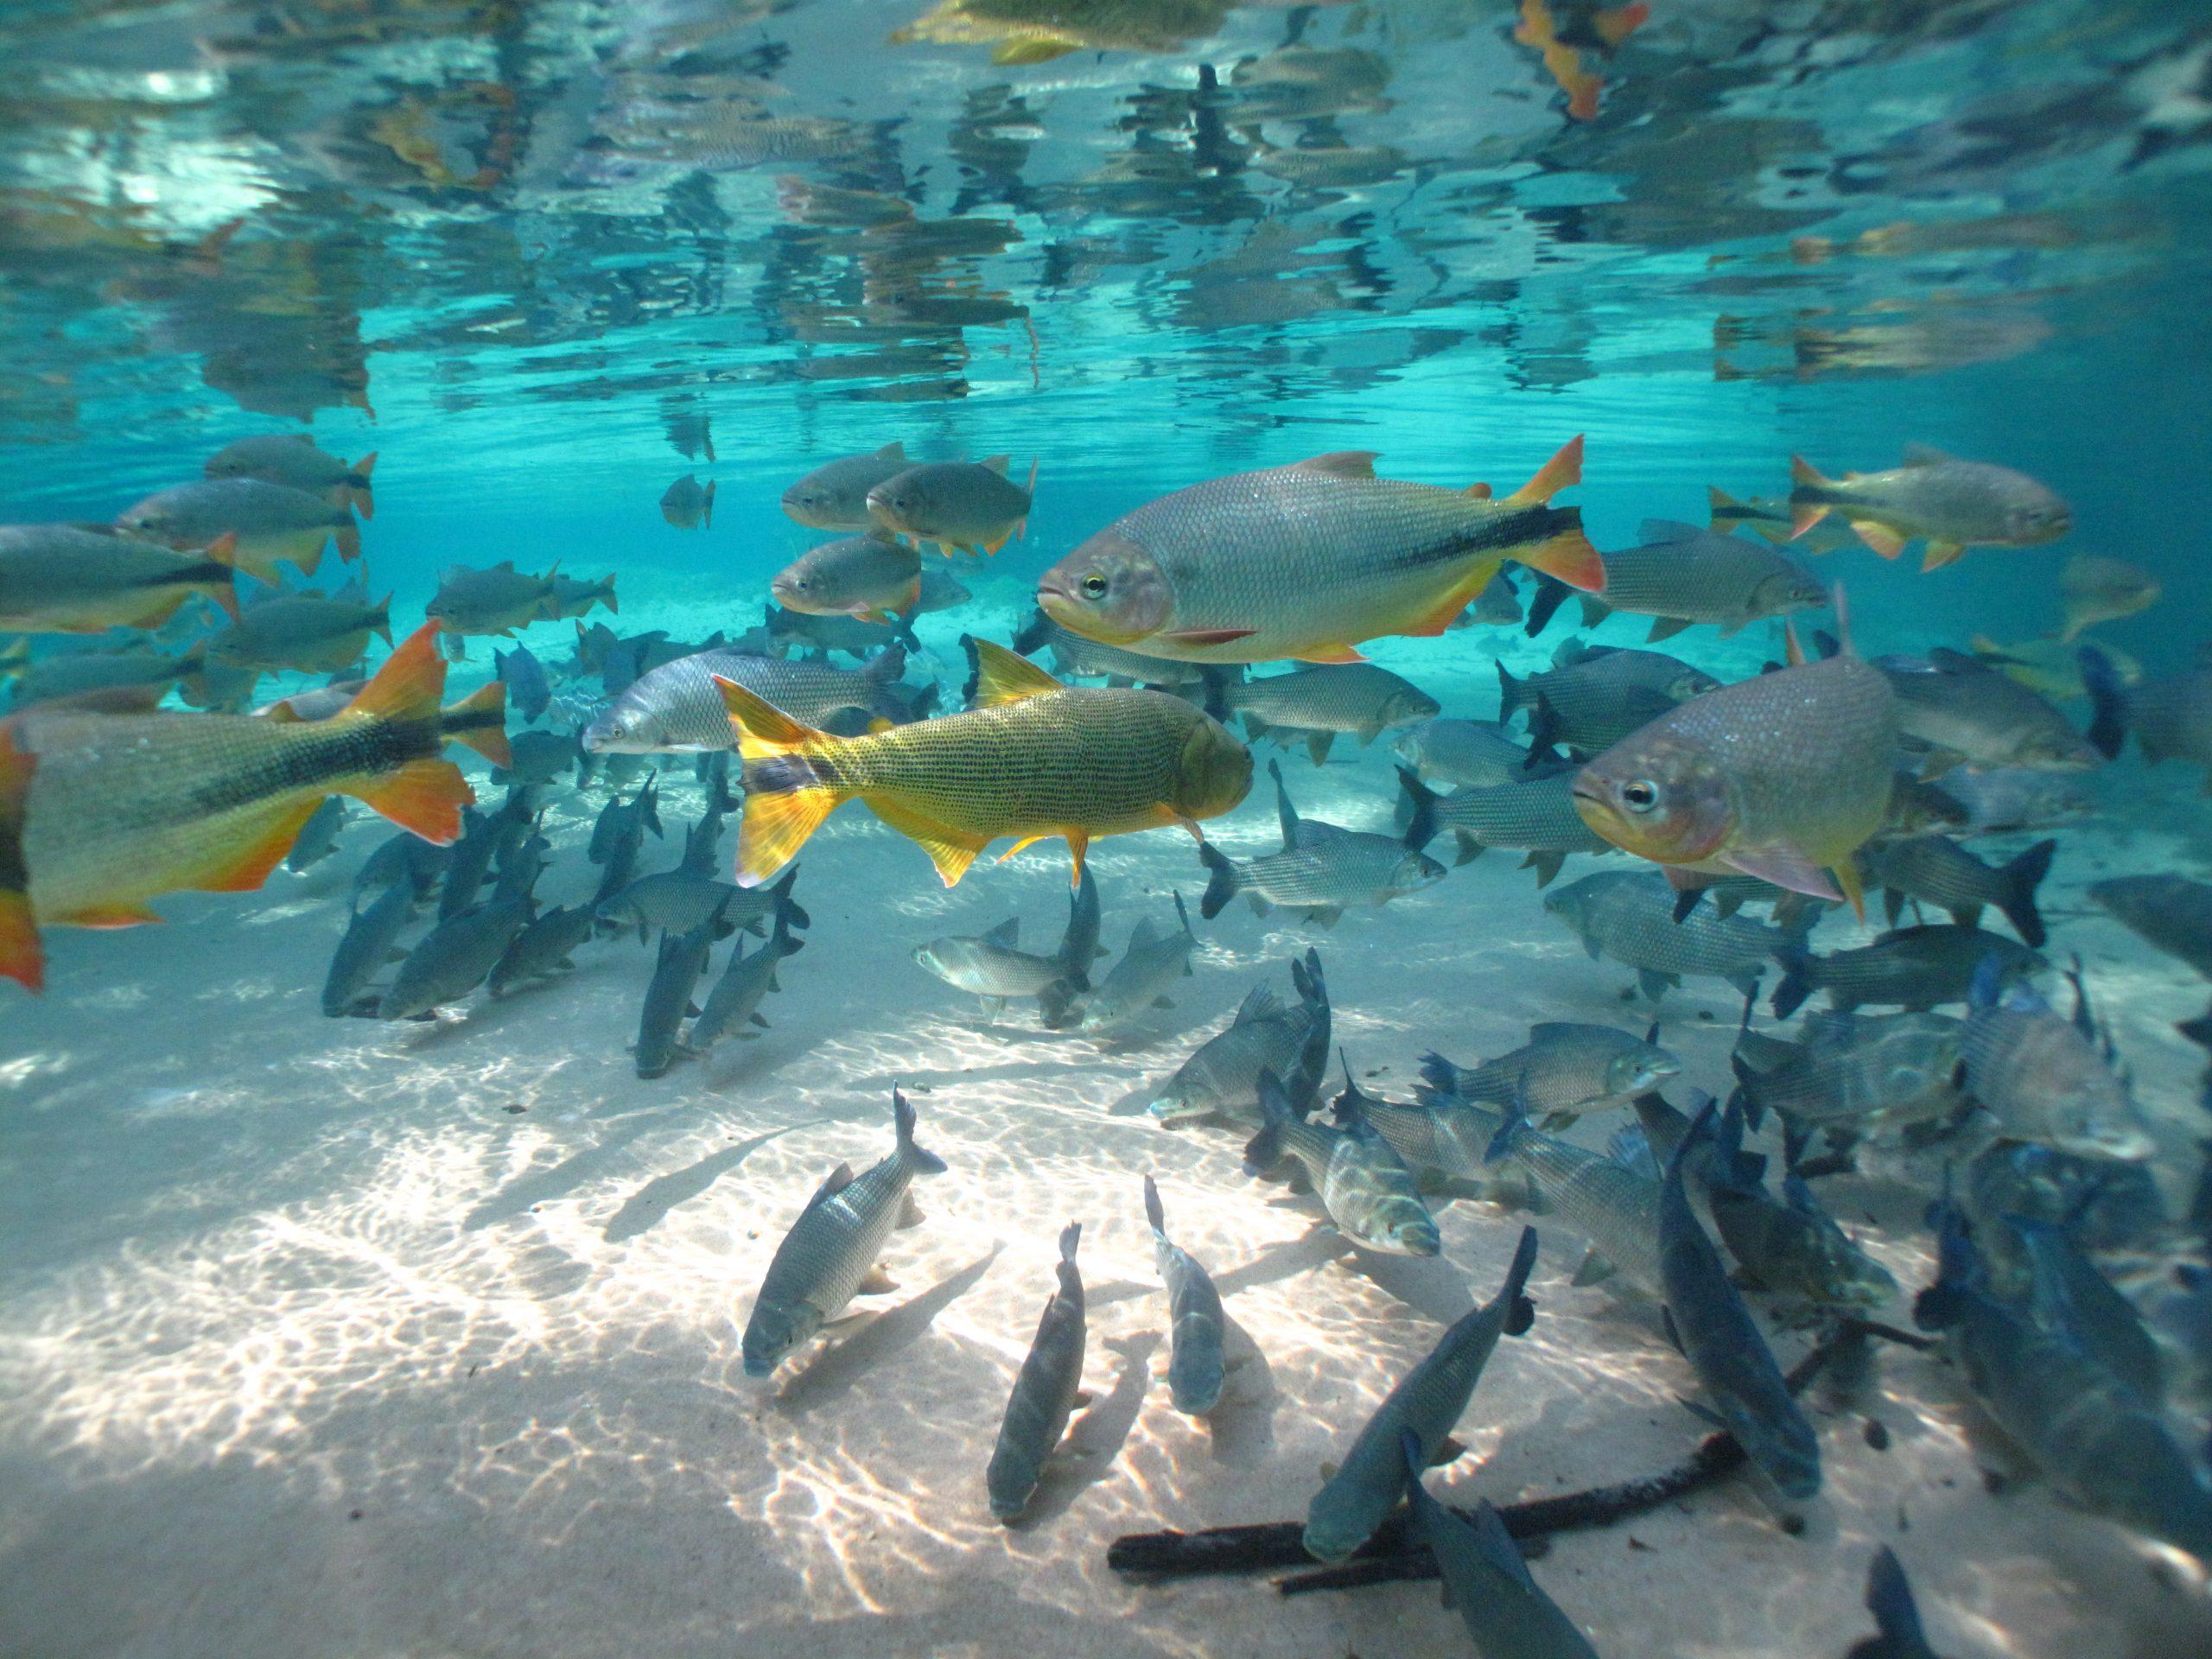 Cardume_de_peixes_-_Fish_shoal_-_André_Turatti